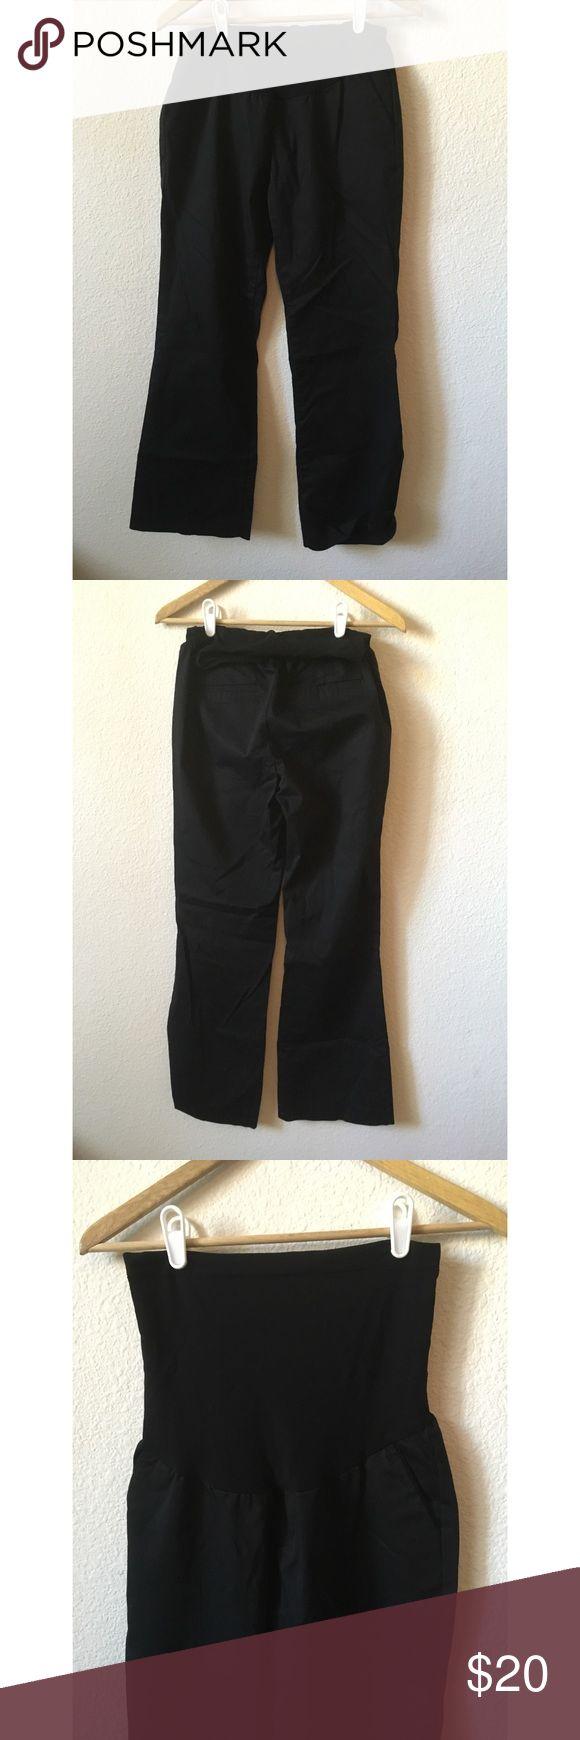 A Pea In The Pod Black Dress Pants A Pea In The Pod Black Dress Pants with stomach band. Size Medium. Body: 97% cotton, 3% spandex; stomach: 84% nylon, 16% spandex. :) Only the pants are for sale! A Pea in the Pod Pants